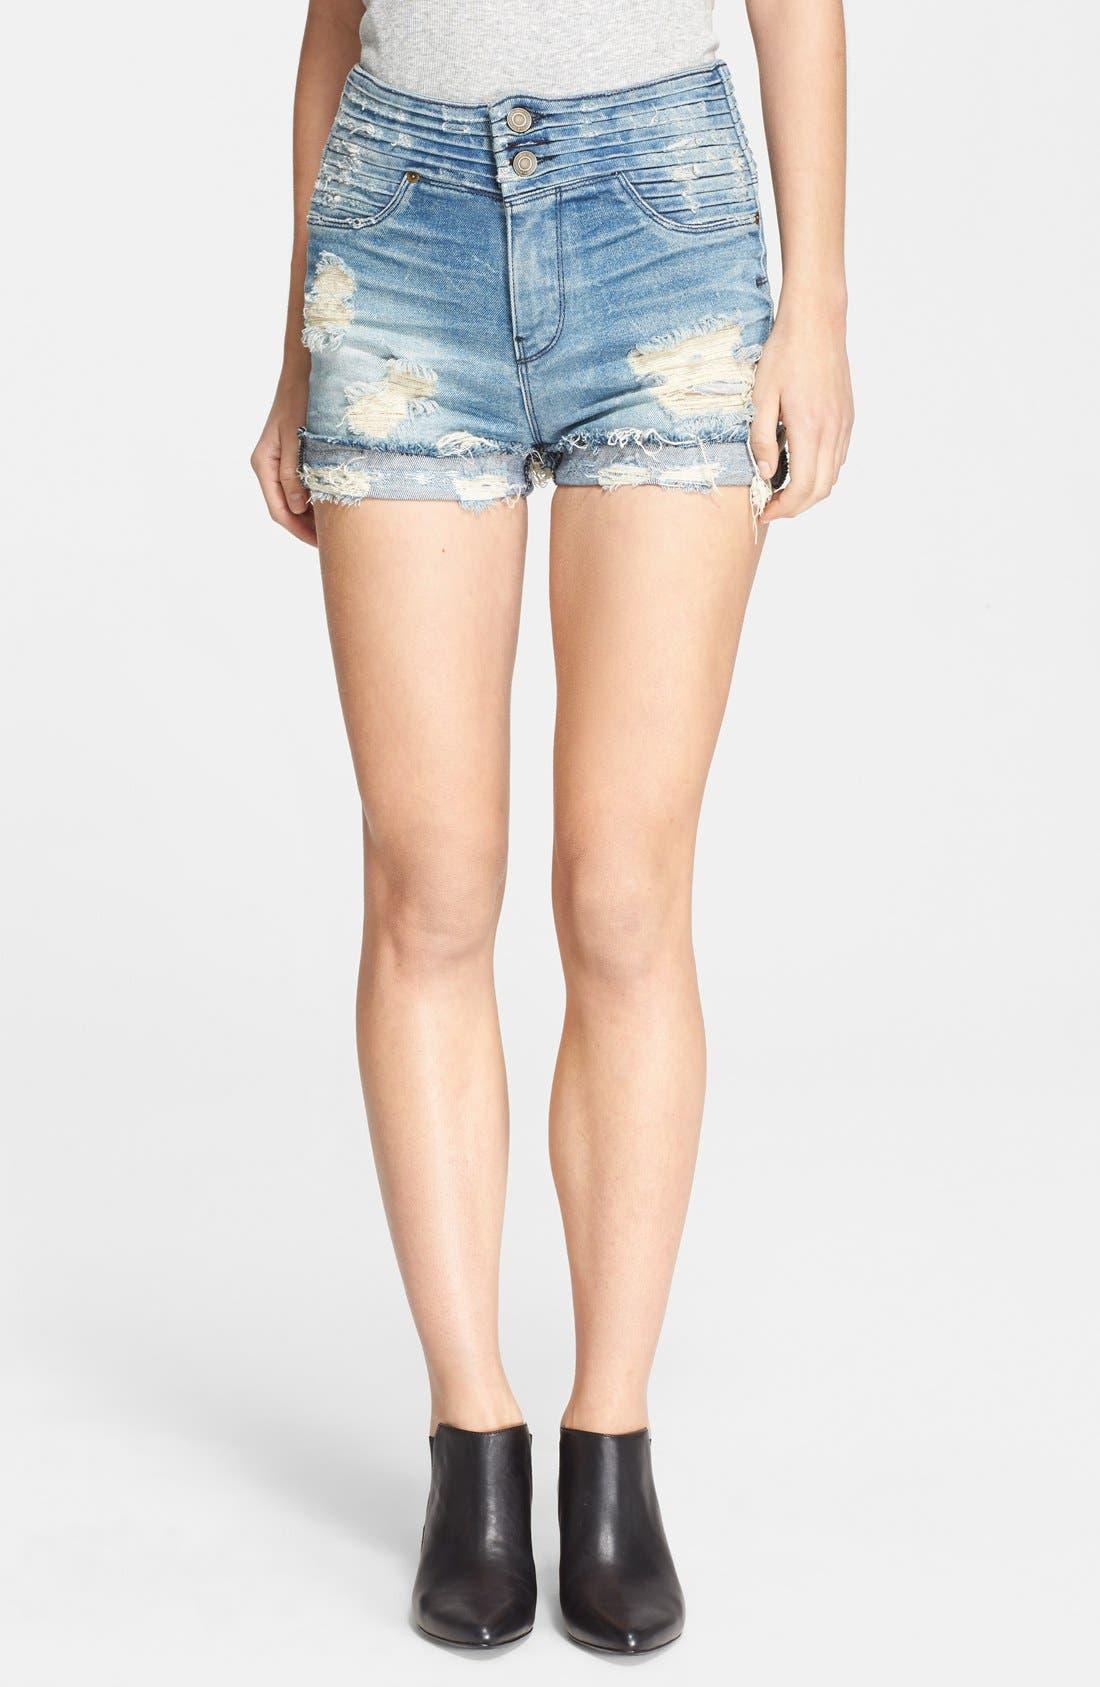 Alternate Image 1 Selected - RtA 'Salvador' Destroyed Jean Shorts